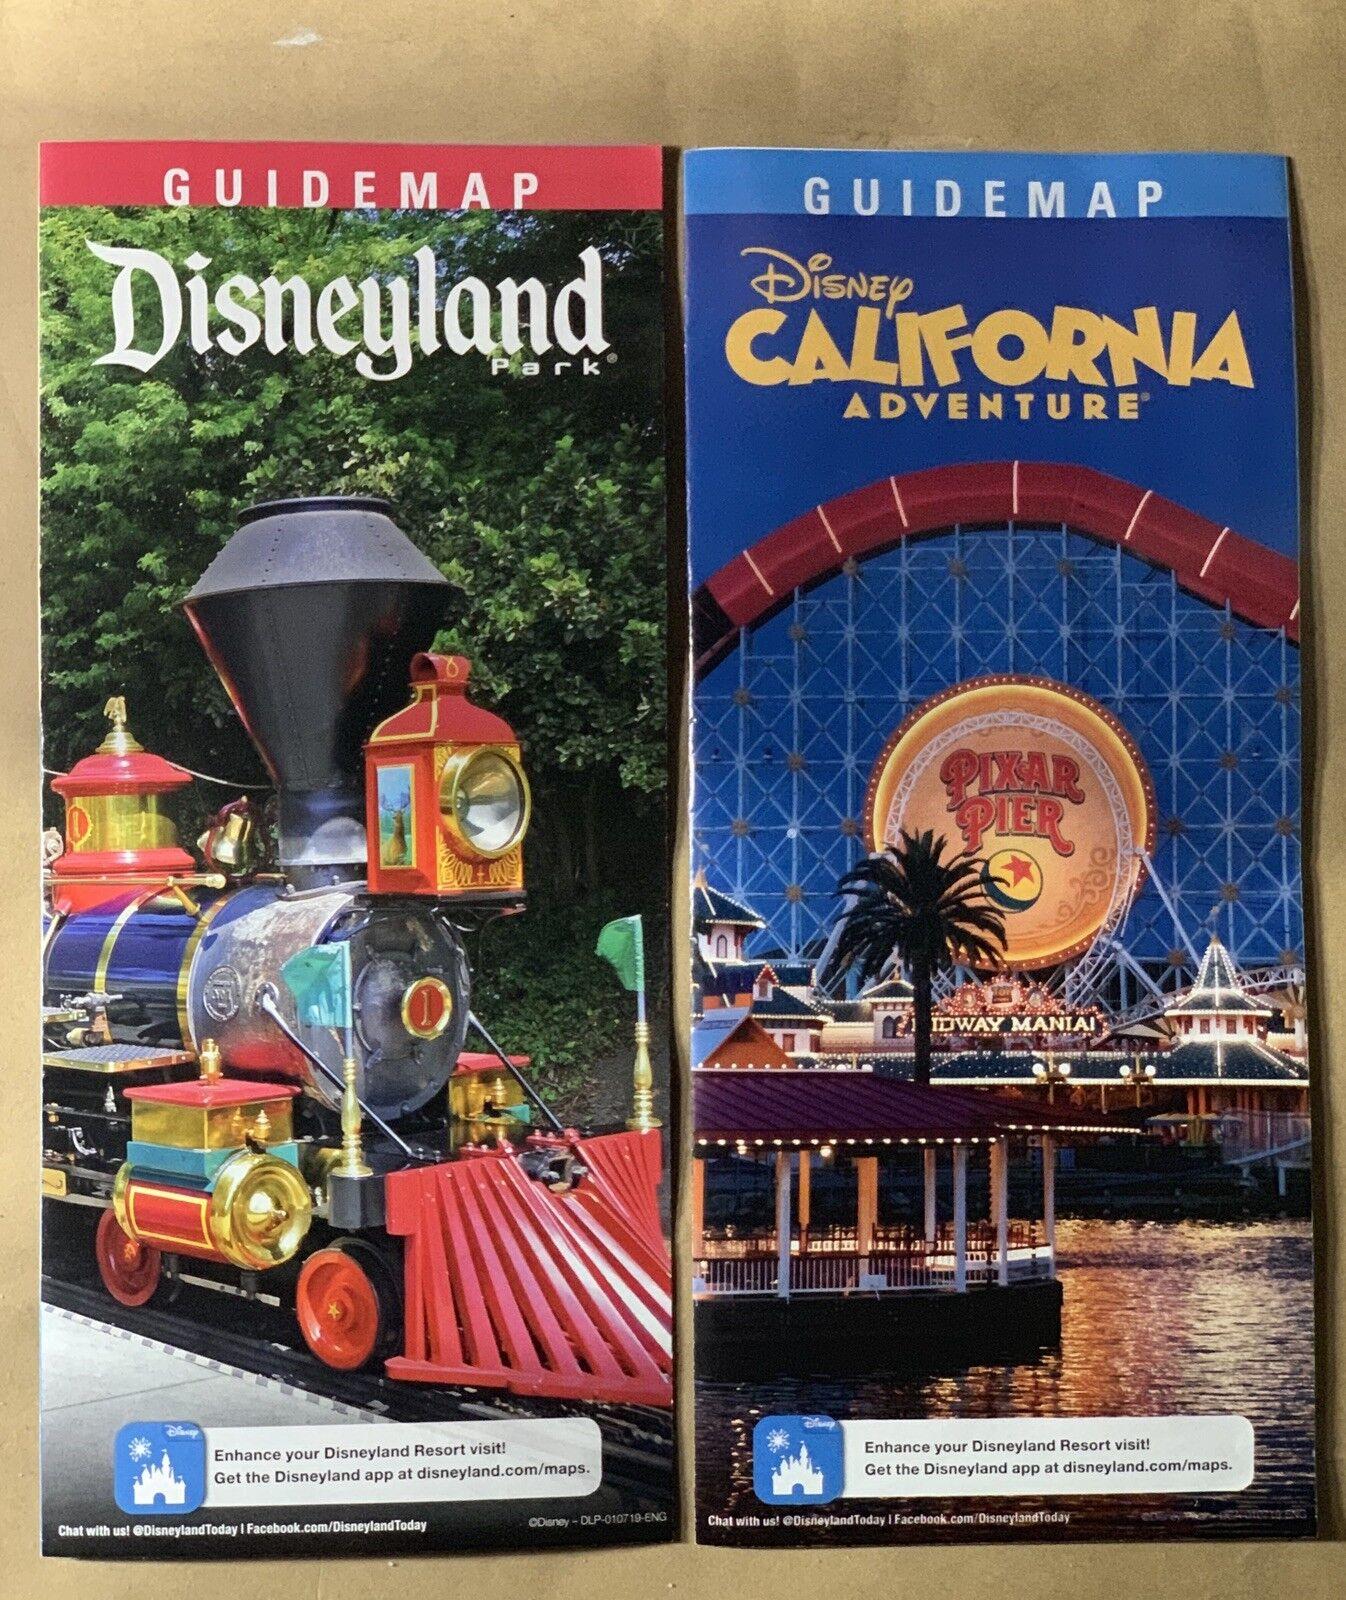 Disneyland And Disney California Adventure January 2019 Guide